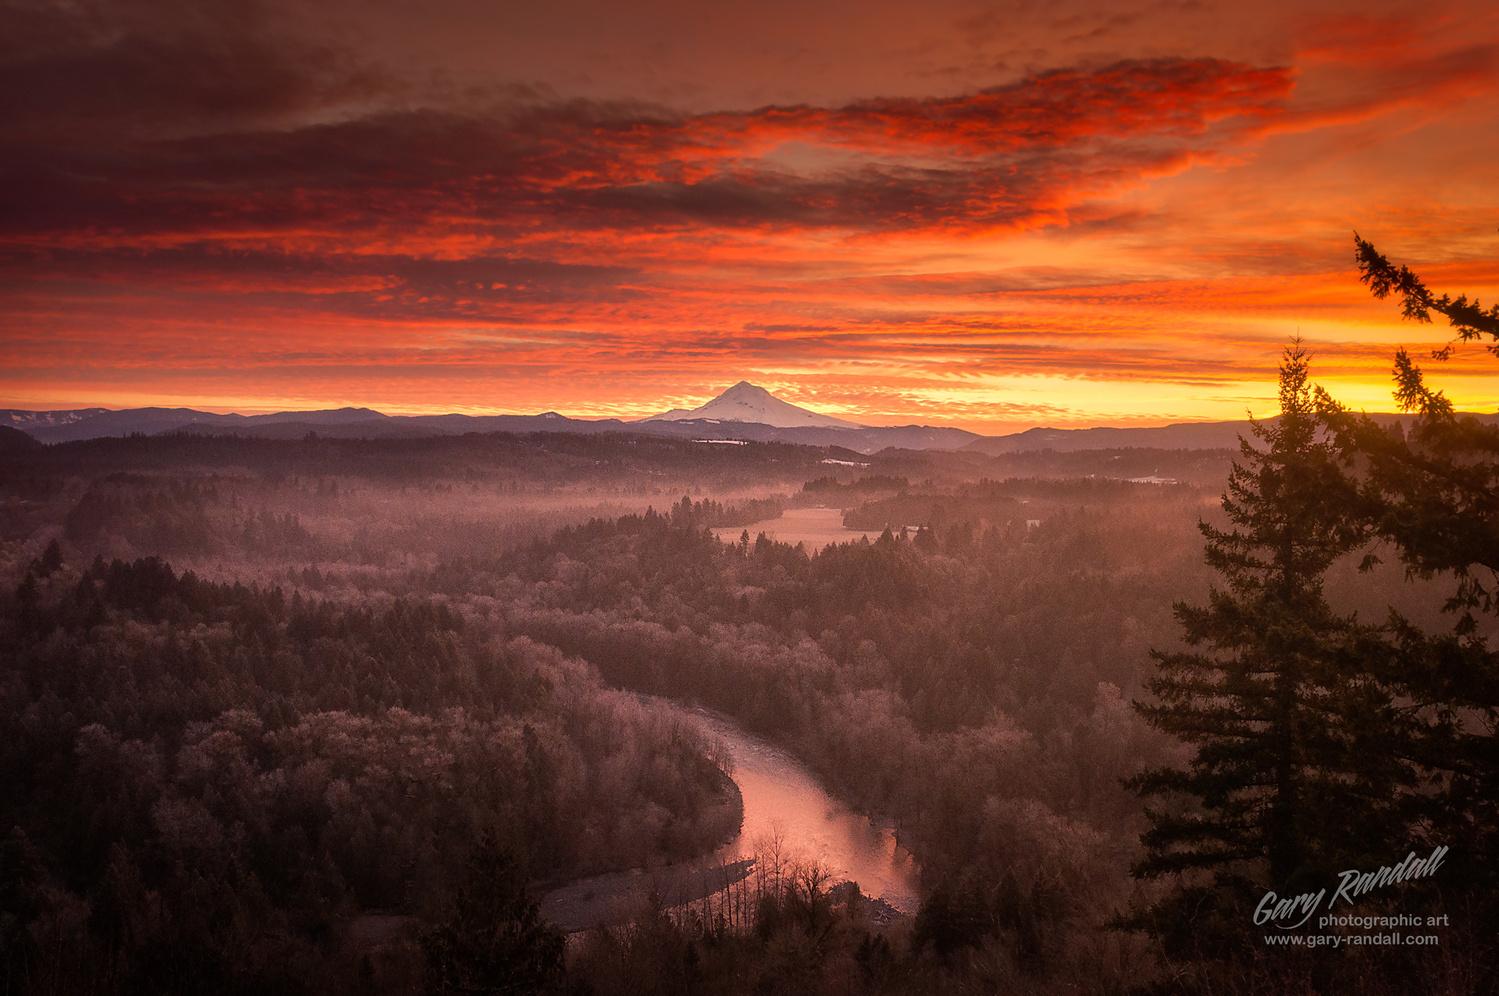 Majestic Morning by Gary Randall